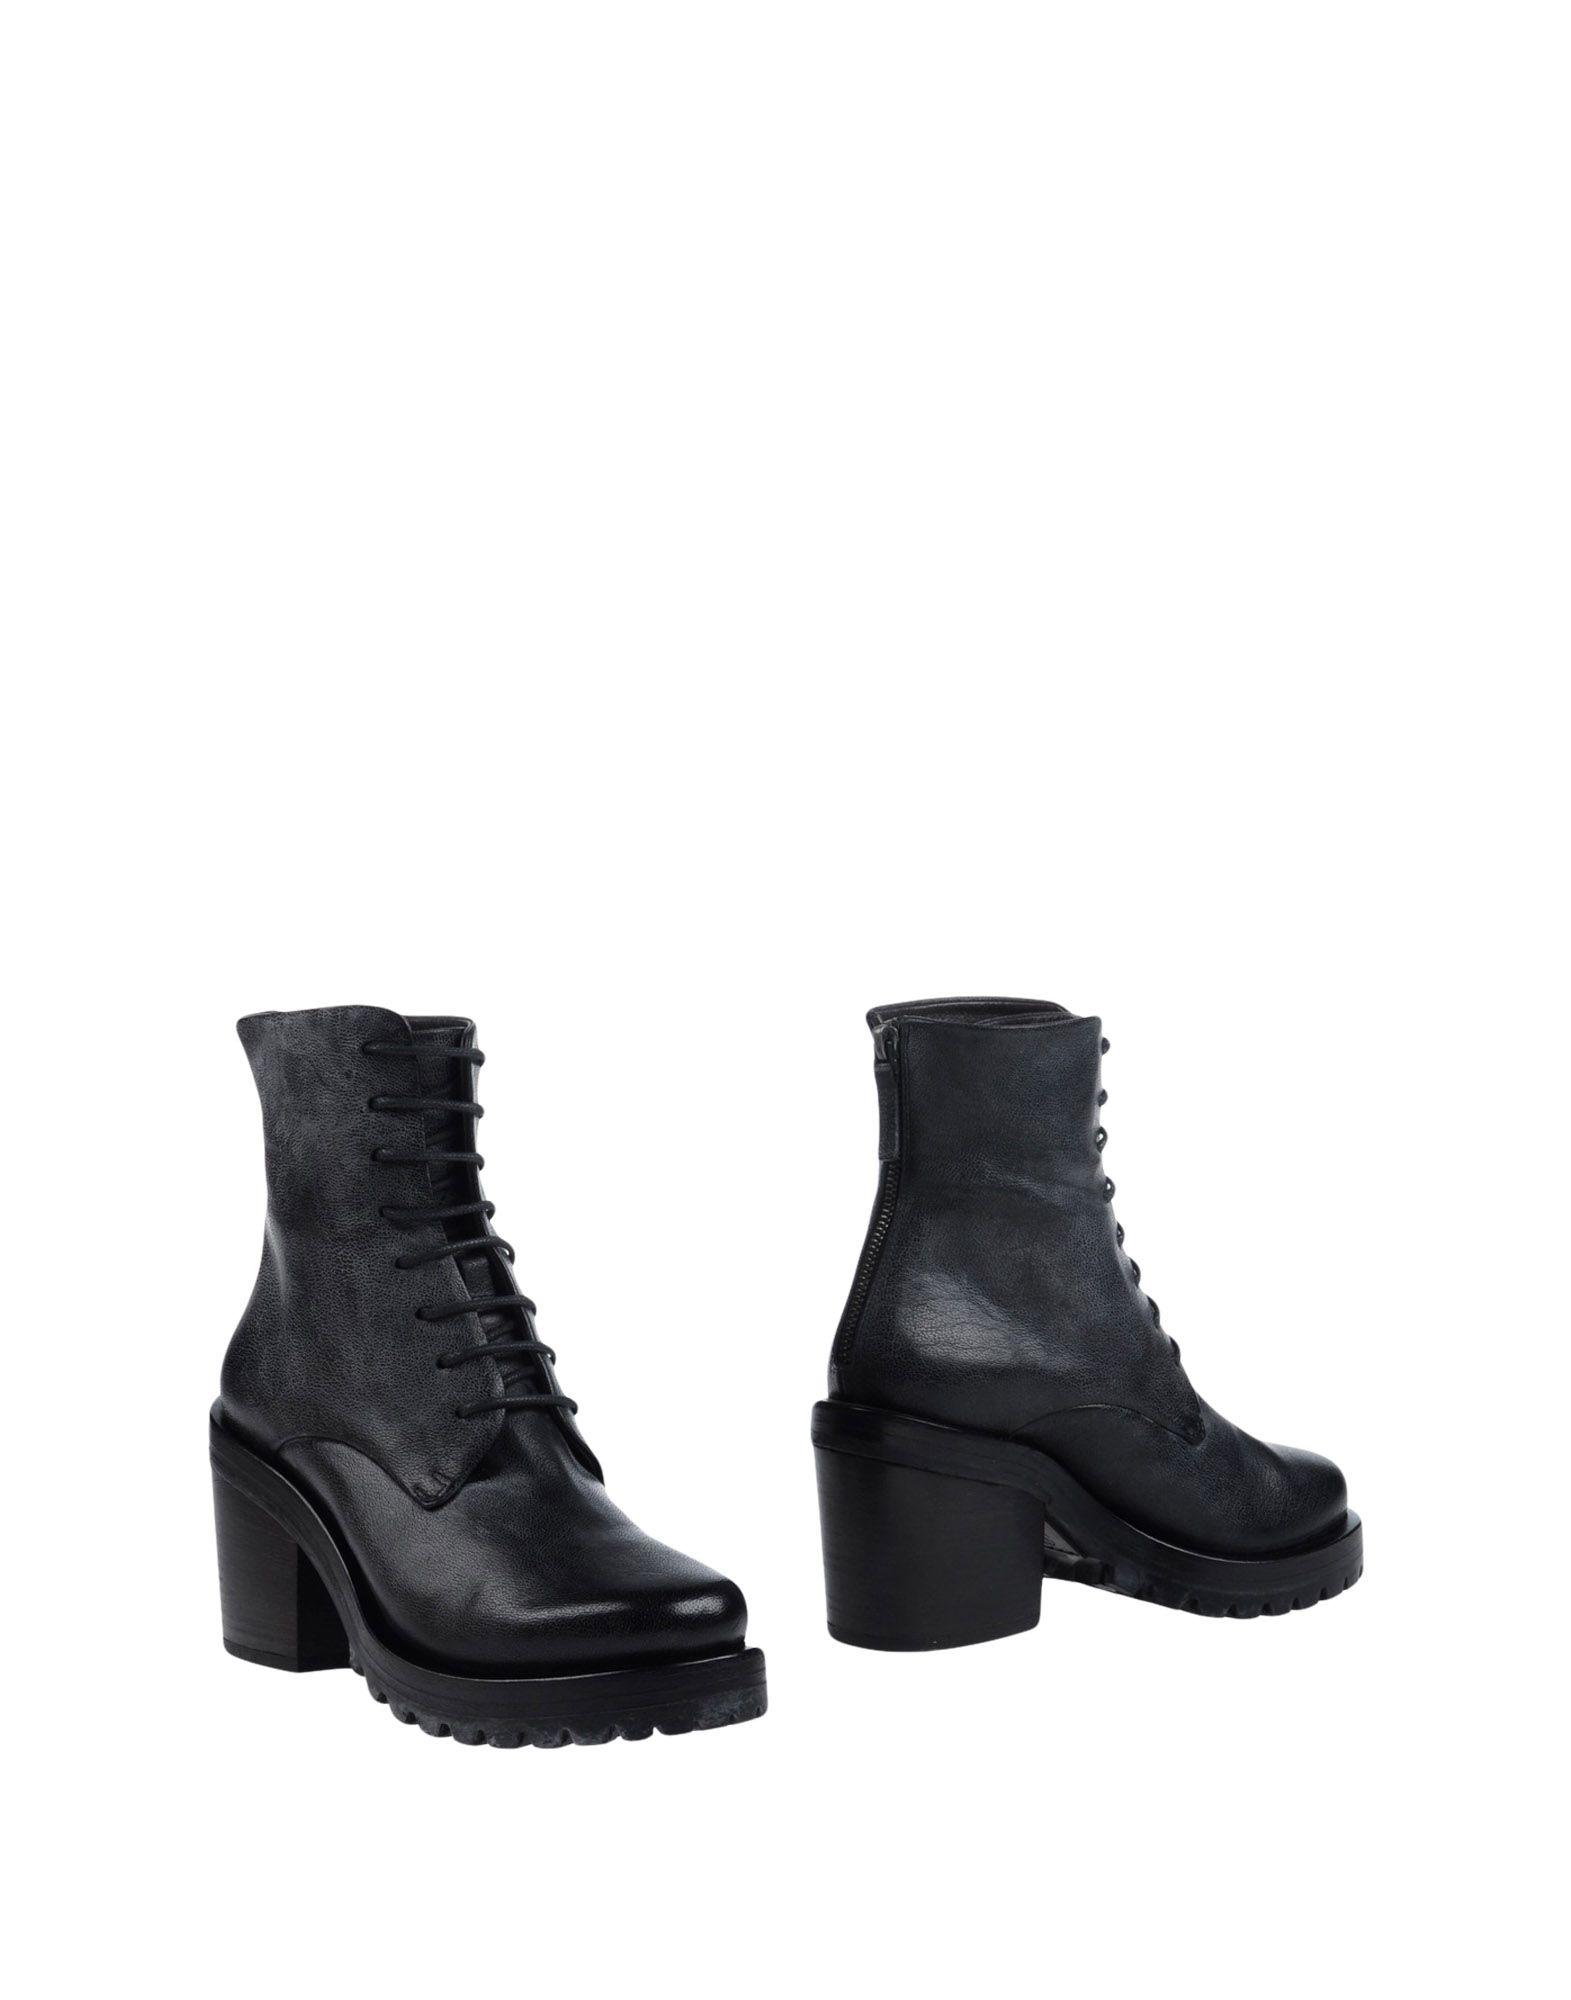 Rabatt Schuhe Settima Stiefelette Damen  11270699CF